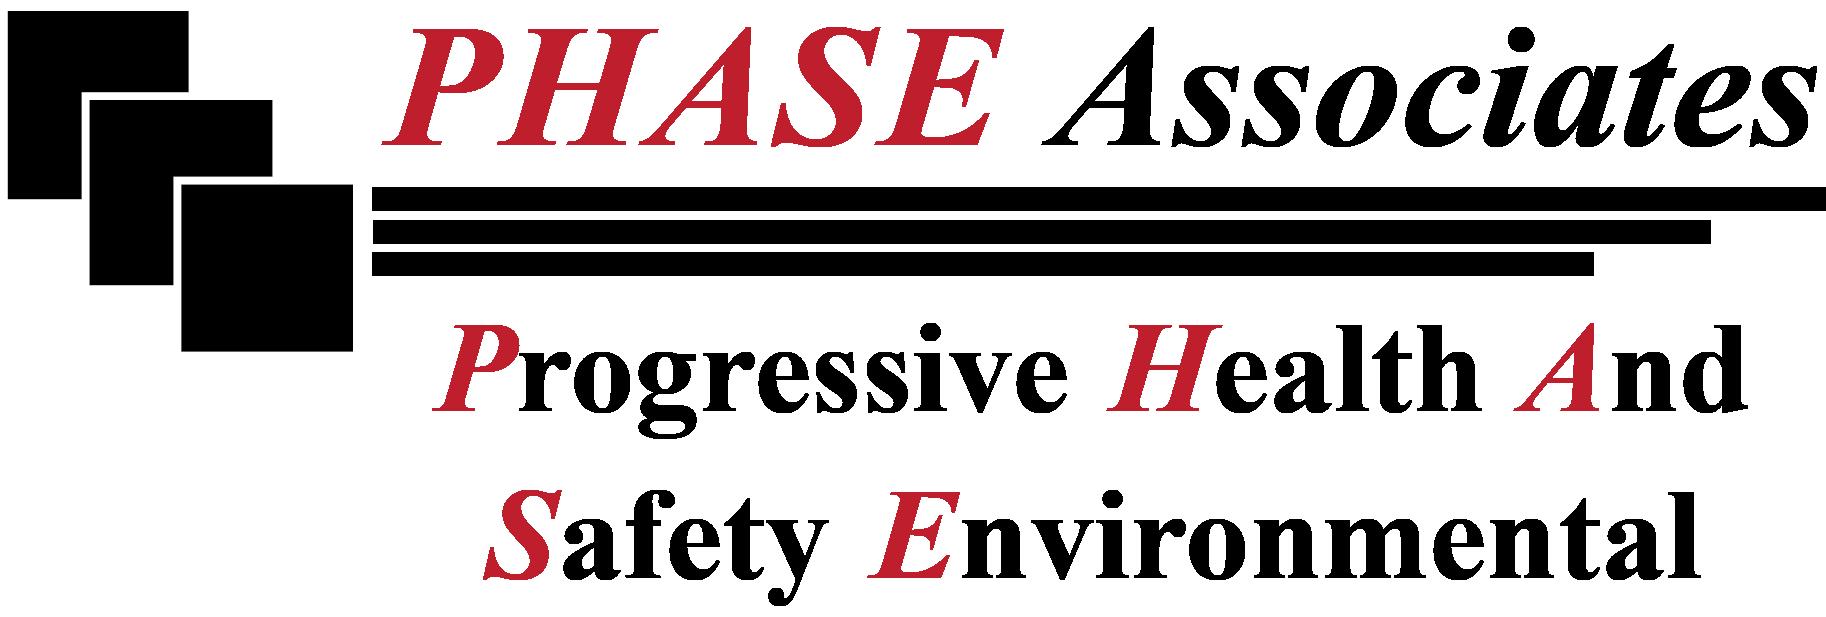 PHASE Associates